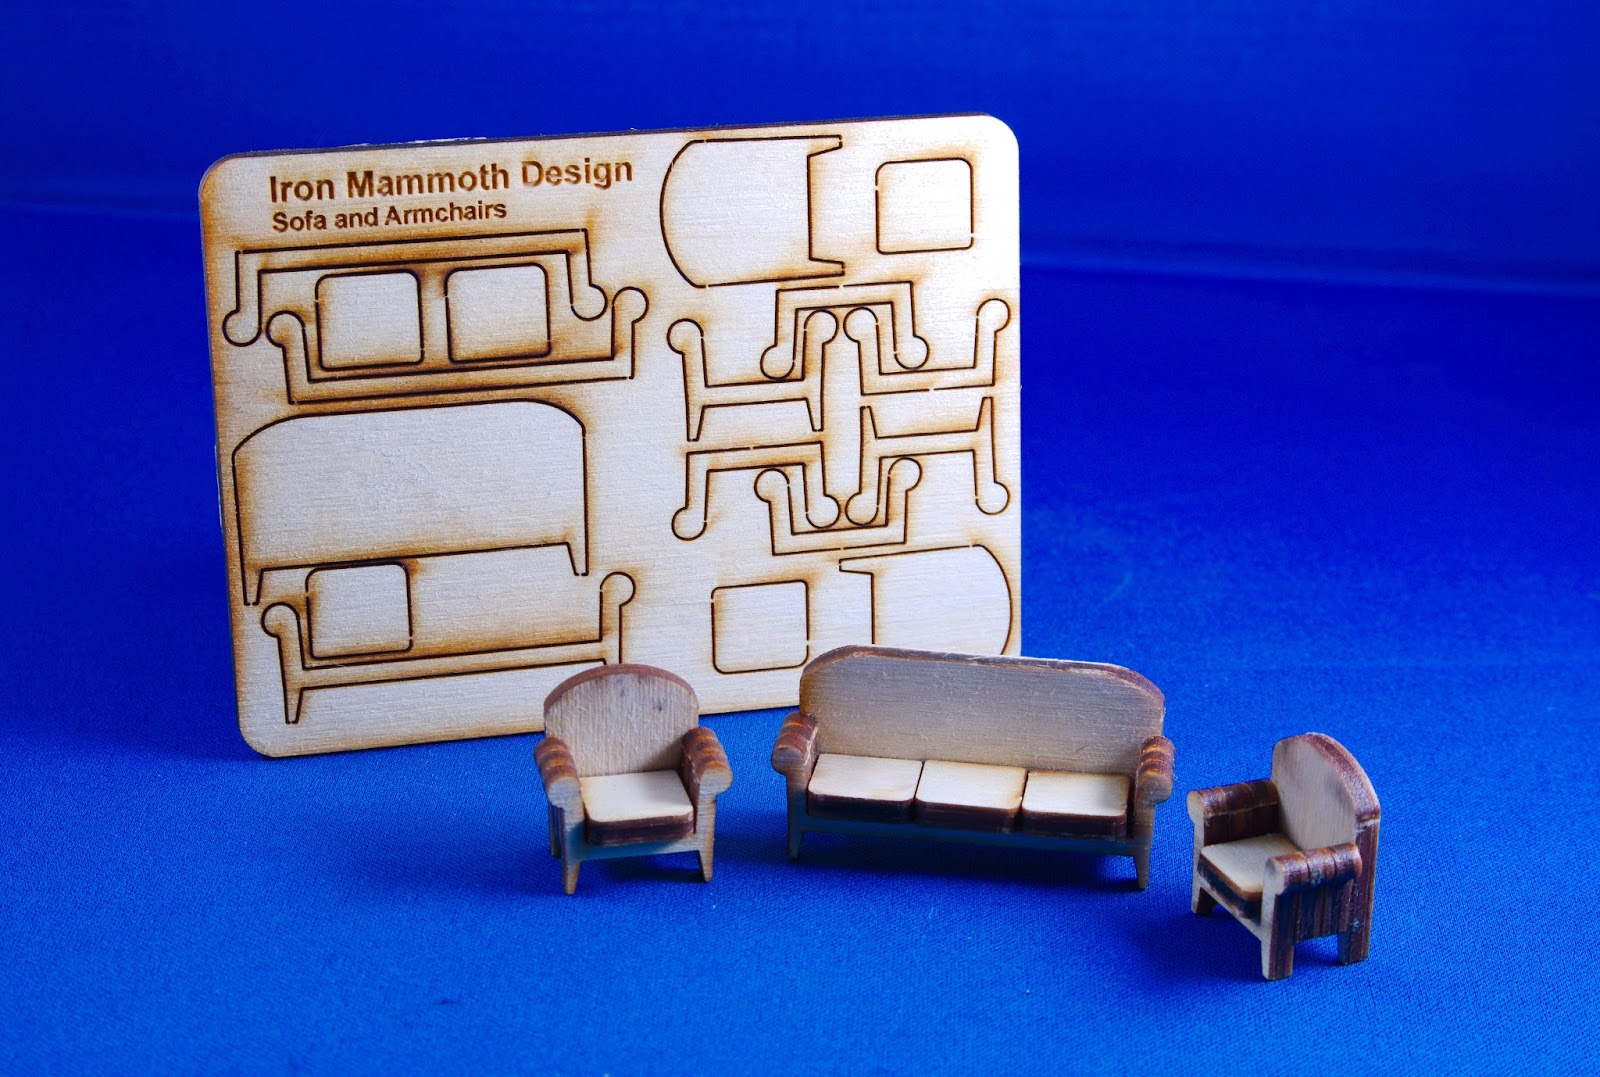 Iron Mammoth s Studio Laser Cut Furniture Kits